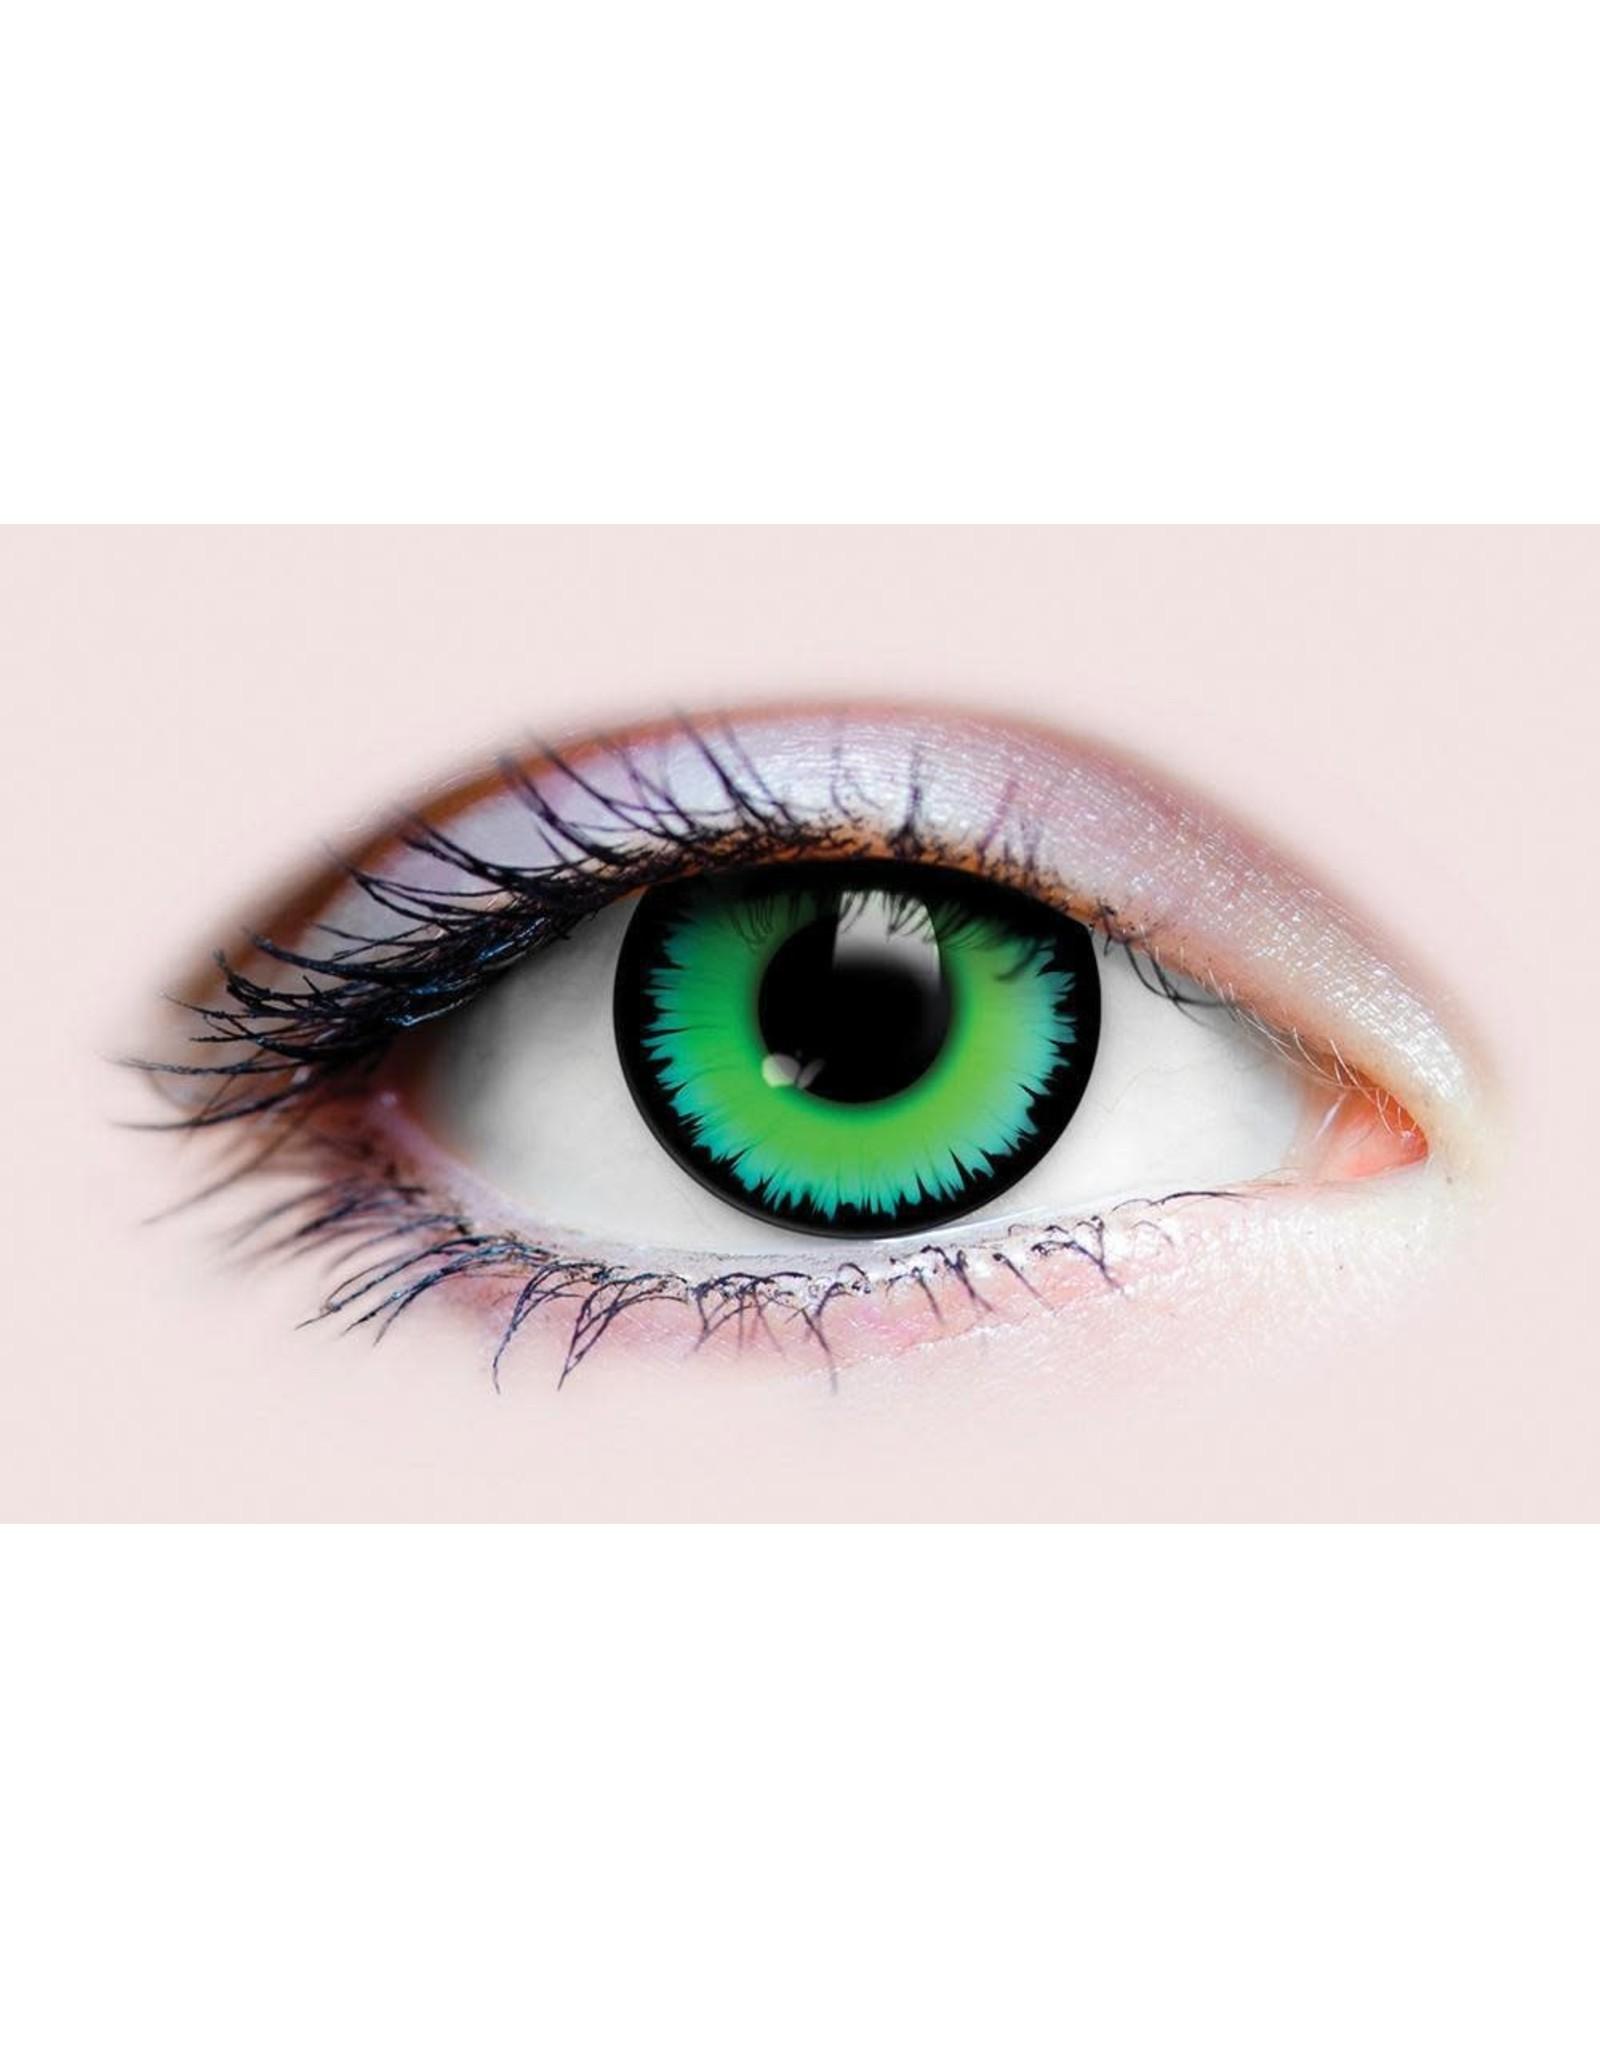 Primal Costume Contact Lenses - Werewof I